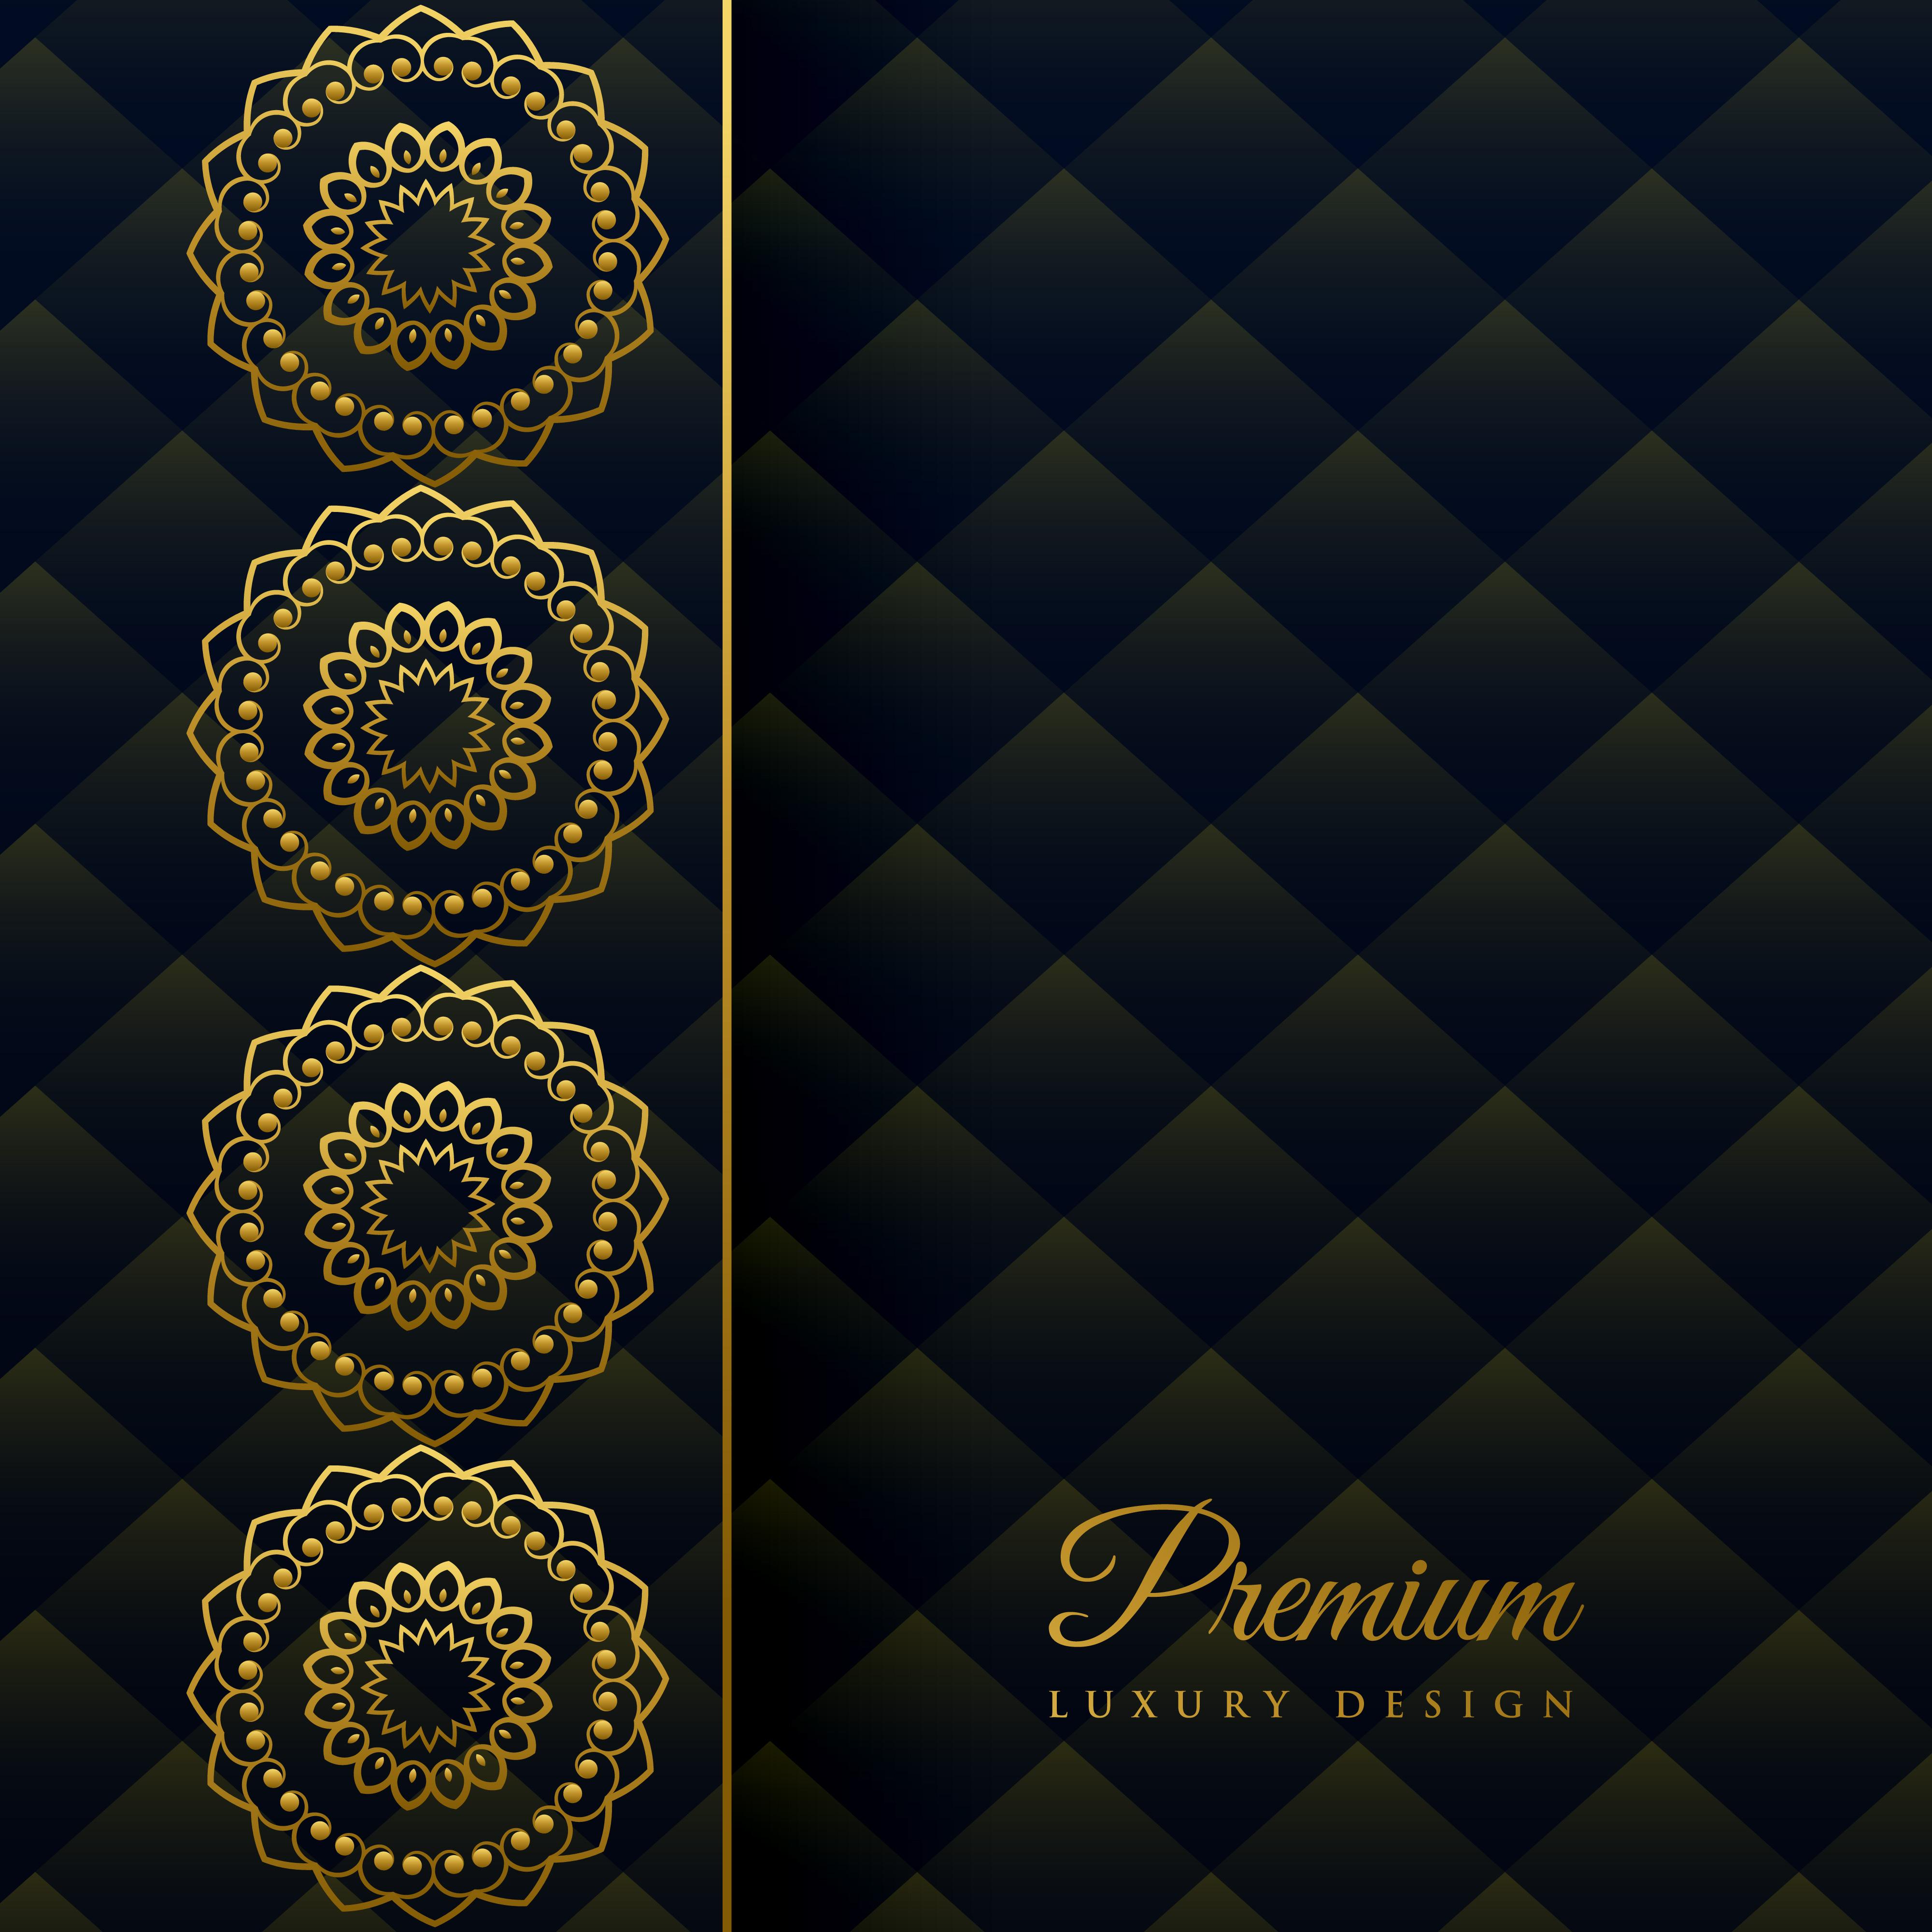 luxury ornamental mandala decoration background  Download Free Vector Art Stock Graphics  Images